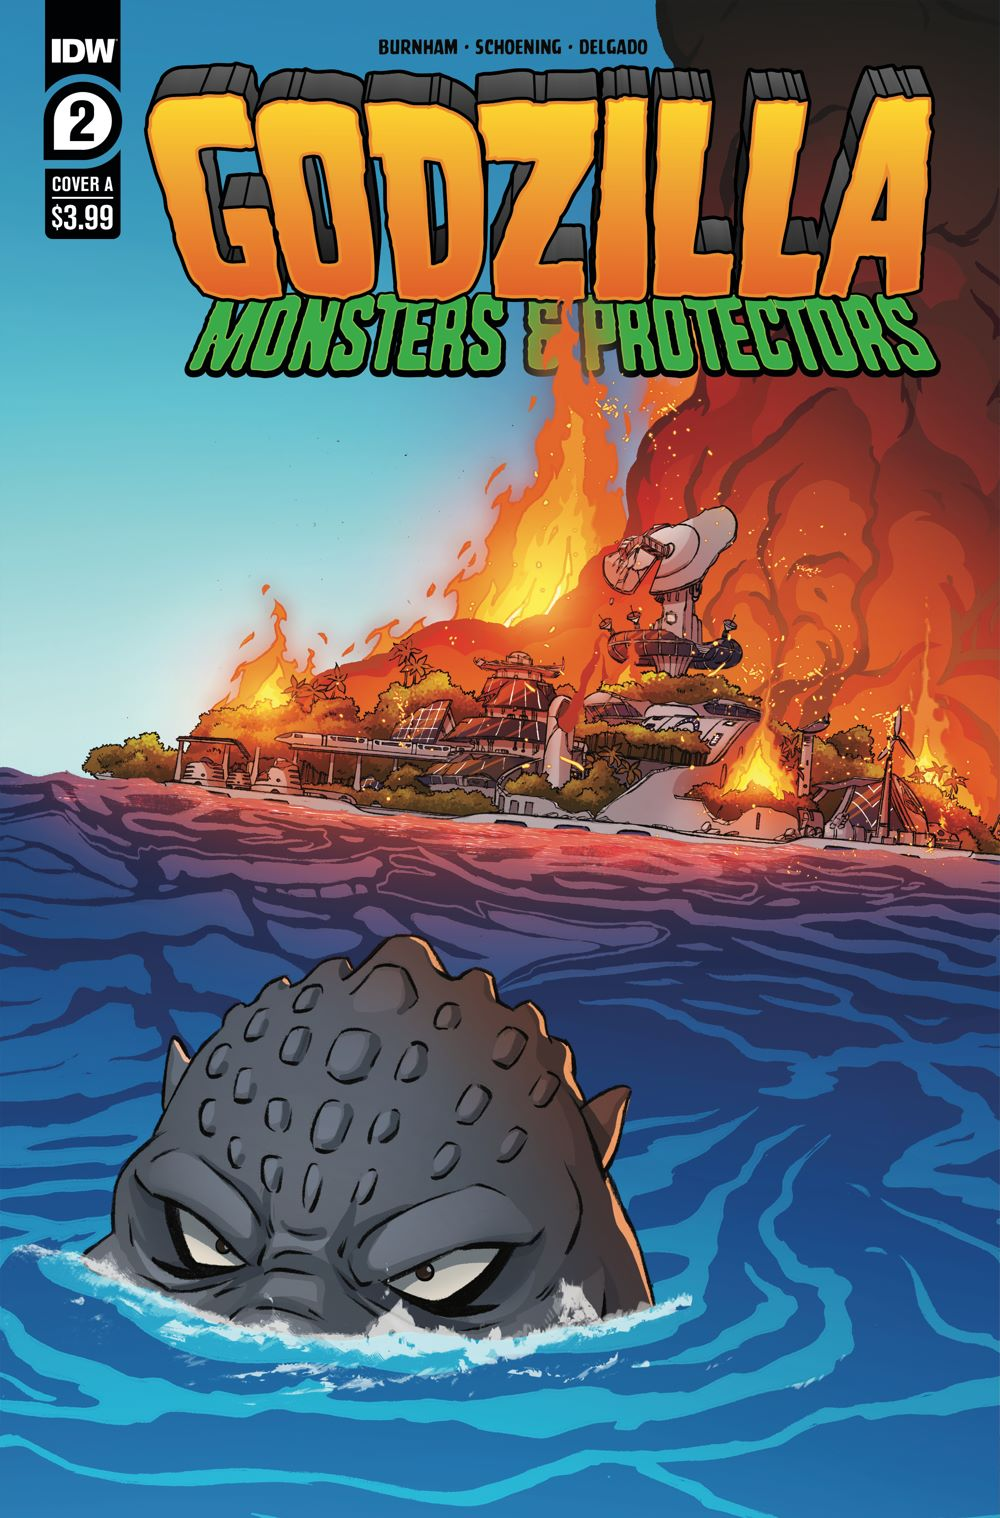 Godzilla_MP02-coverA ComicList Previews: GODZILLA MONSTERS AND PROTECTORS #2 (OF 5)